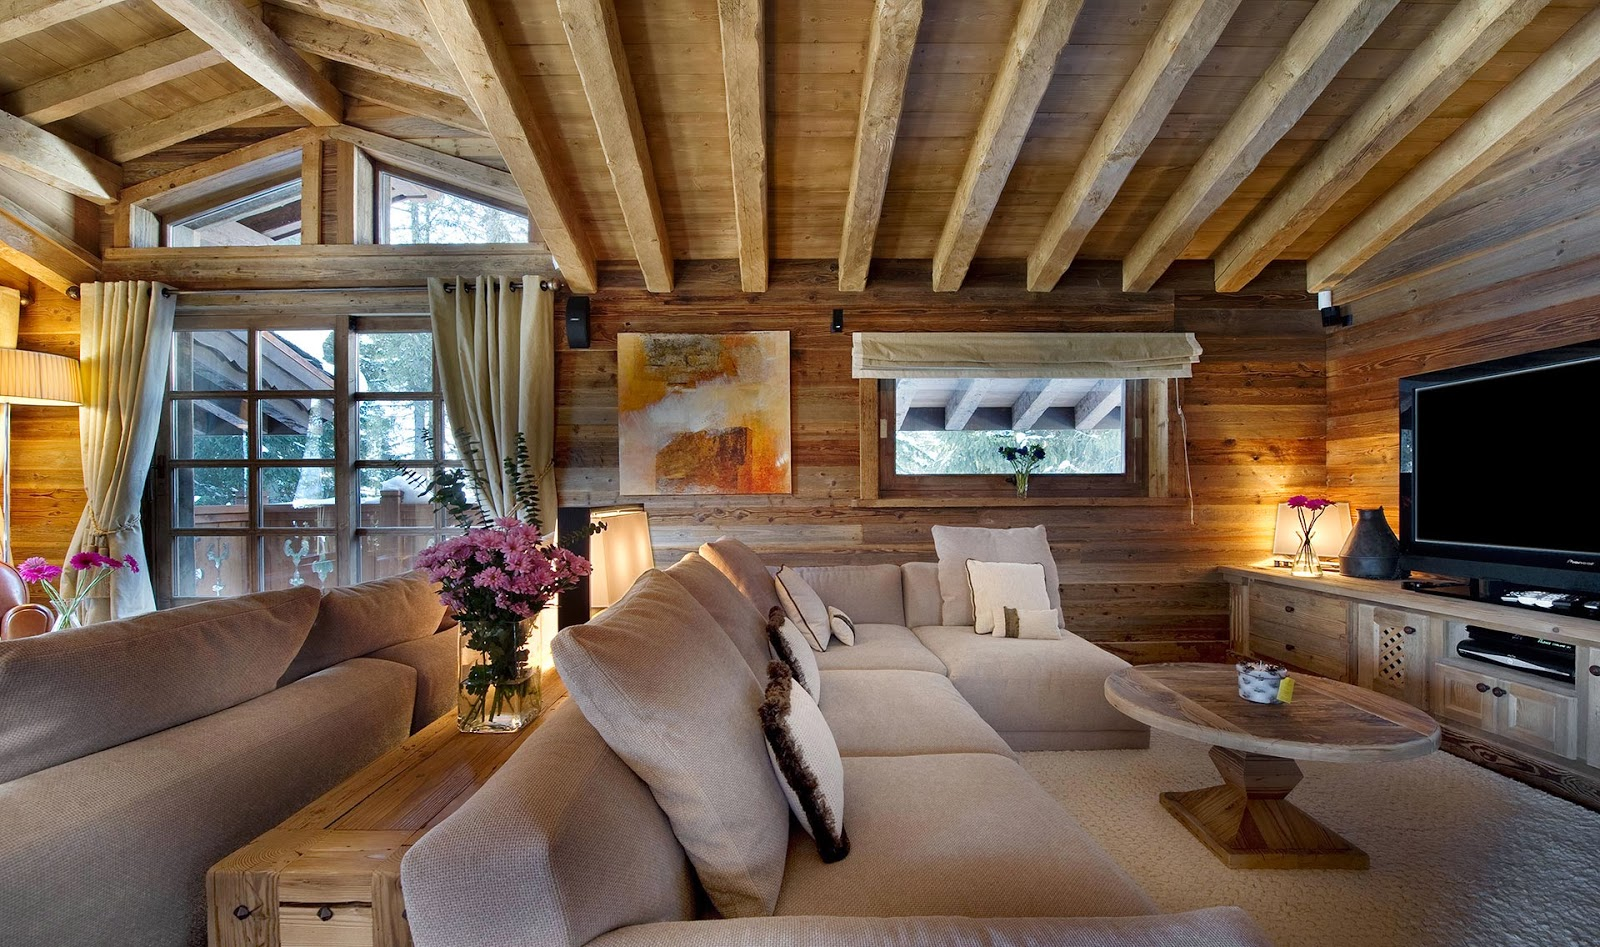 Hometrotter home style blog casa arredamento design for Arredamento case di lusso interior design